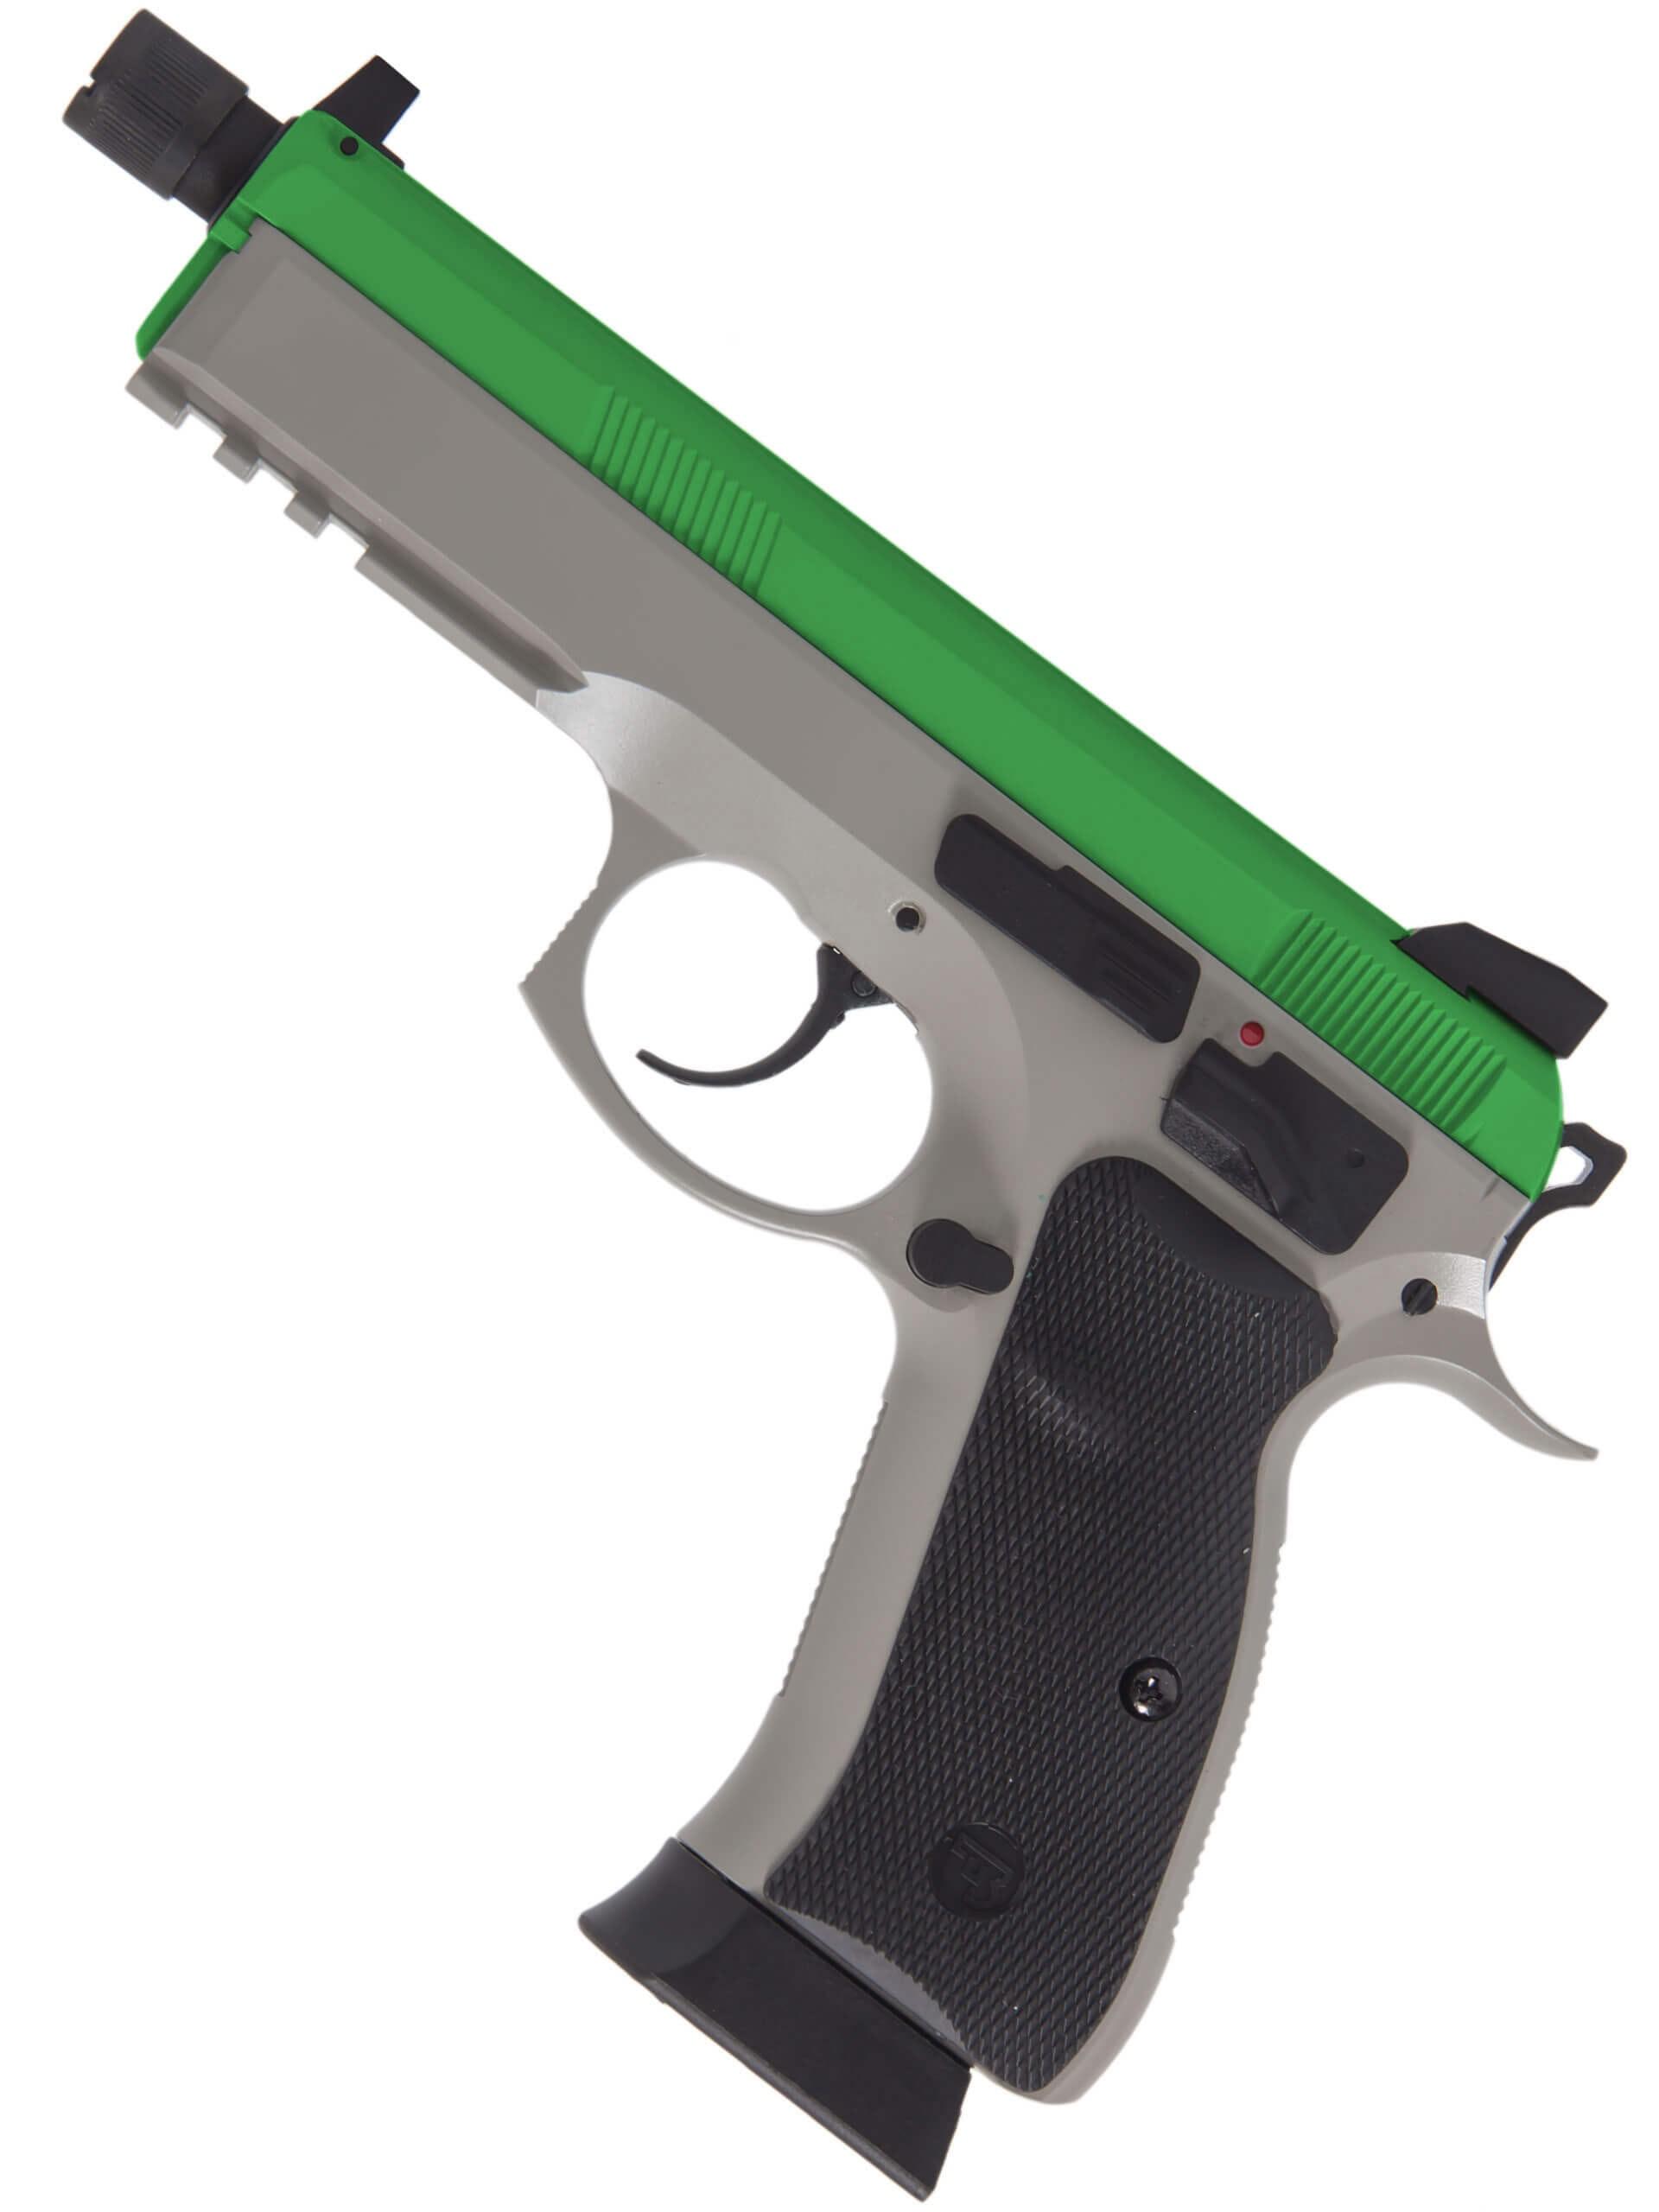 ASG CZ SP-01 Shadow CO2 Blowback Pistol